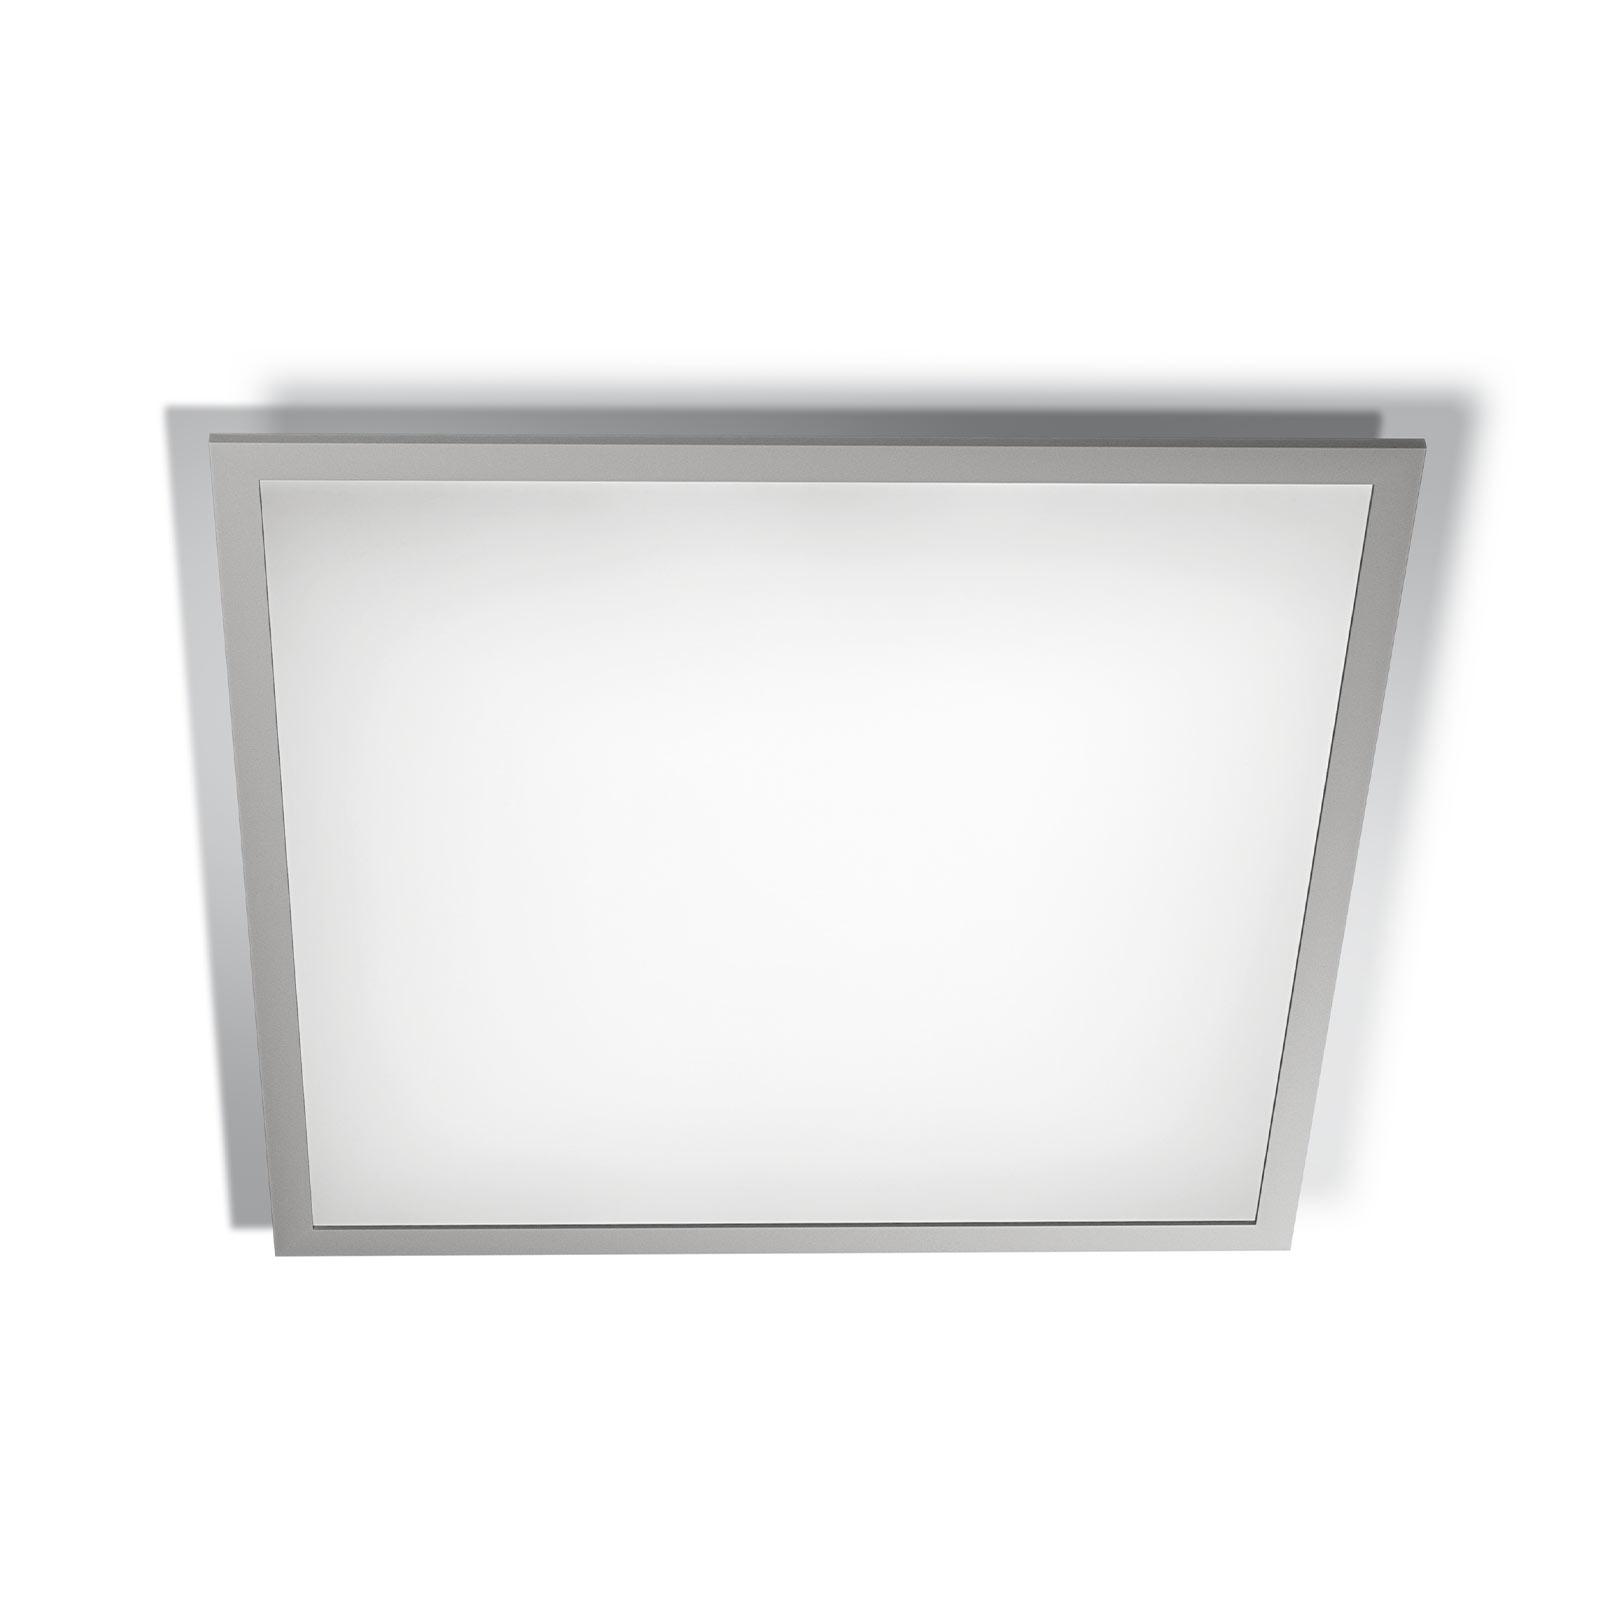 LEDVANCE Planon Plus LED paneel 60x60cm 830 36W